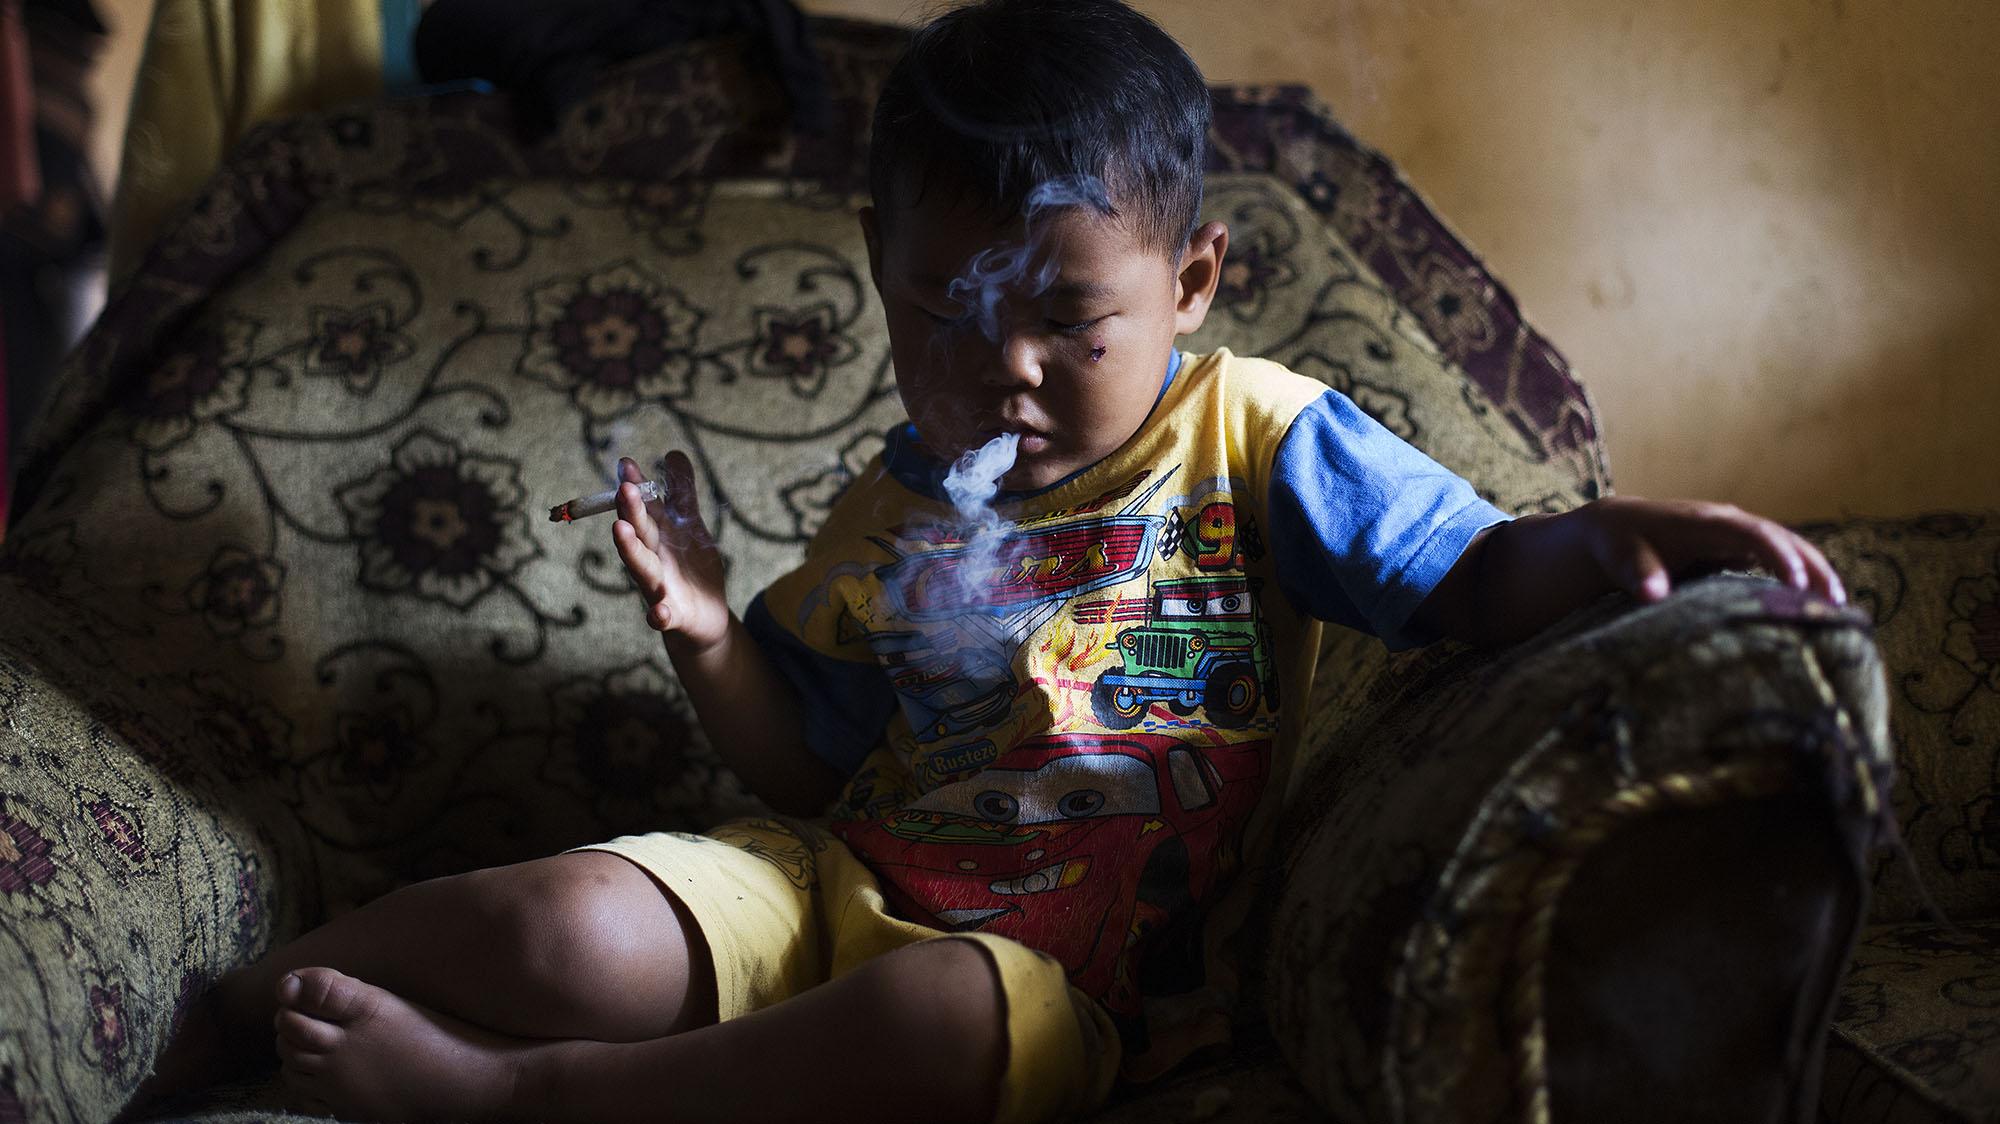 Marlboro Boys: Indonesia's Youngest Smokers Light Up